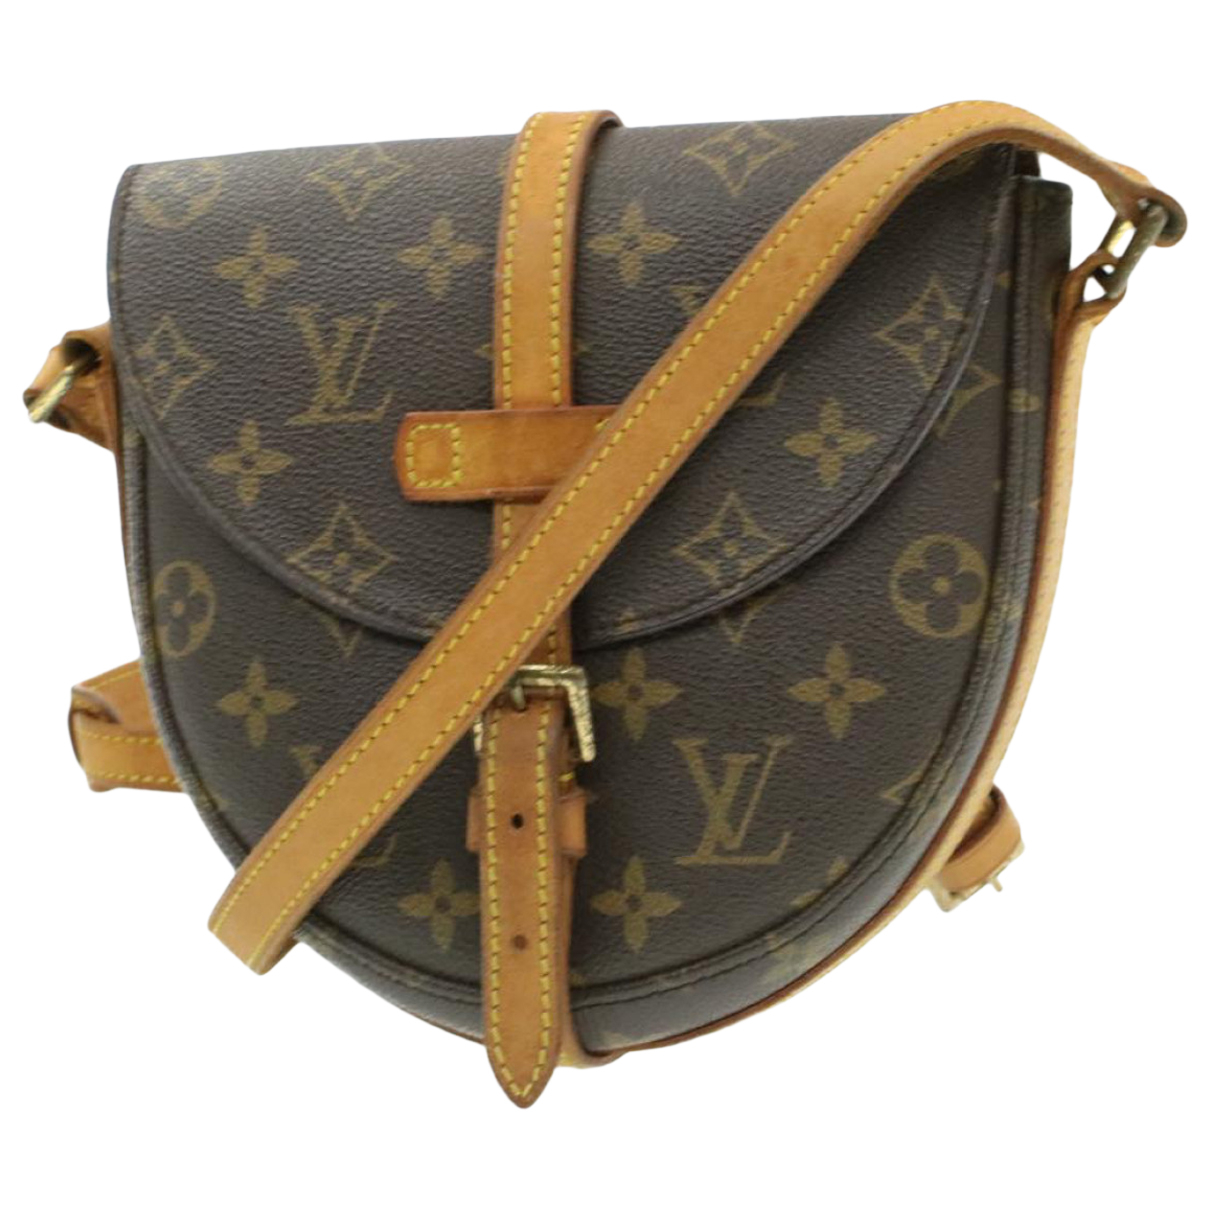 Louis Vuitton - Sac a main Chantilly pour femme en toile - marron